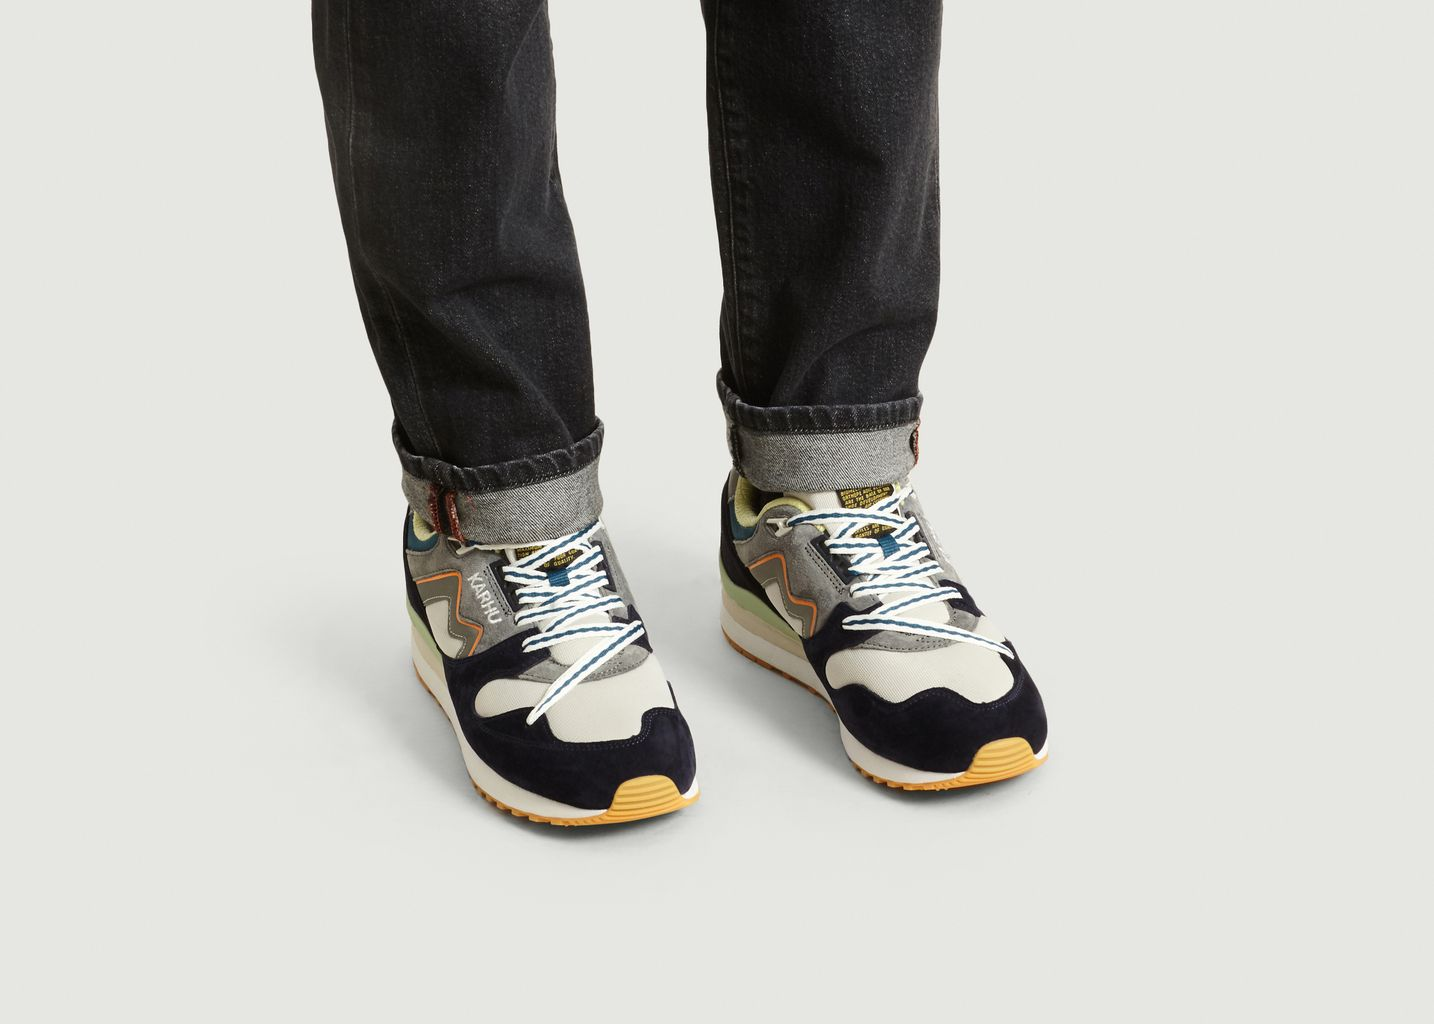 Sneakers Synchron - Karhu